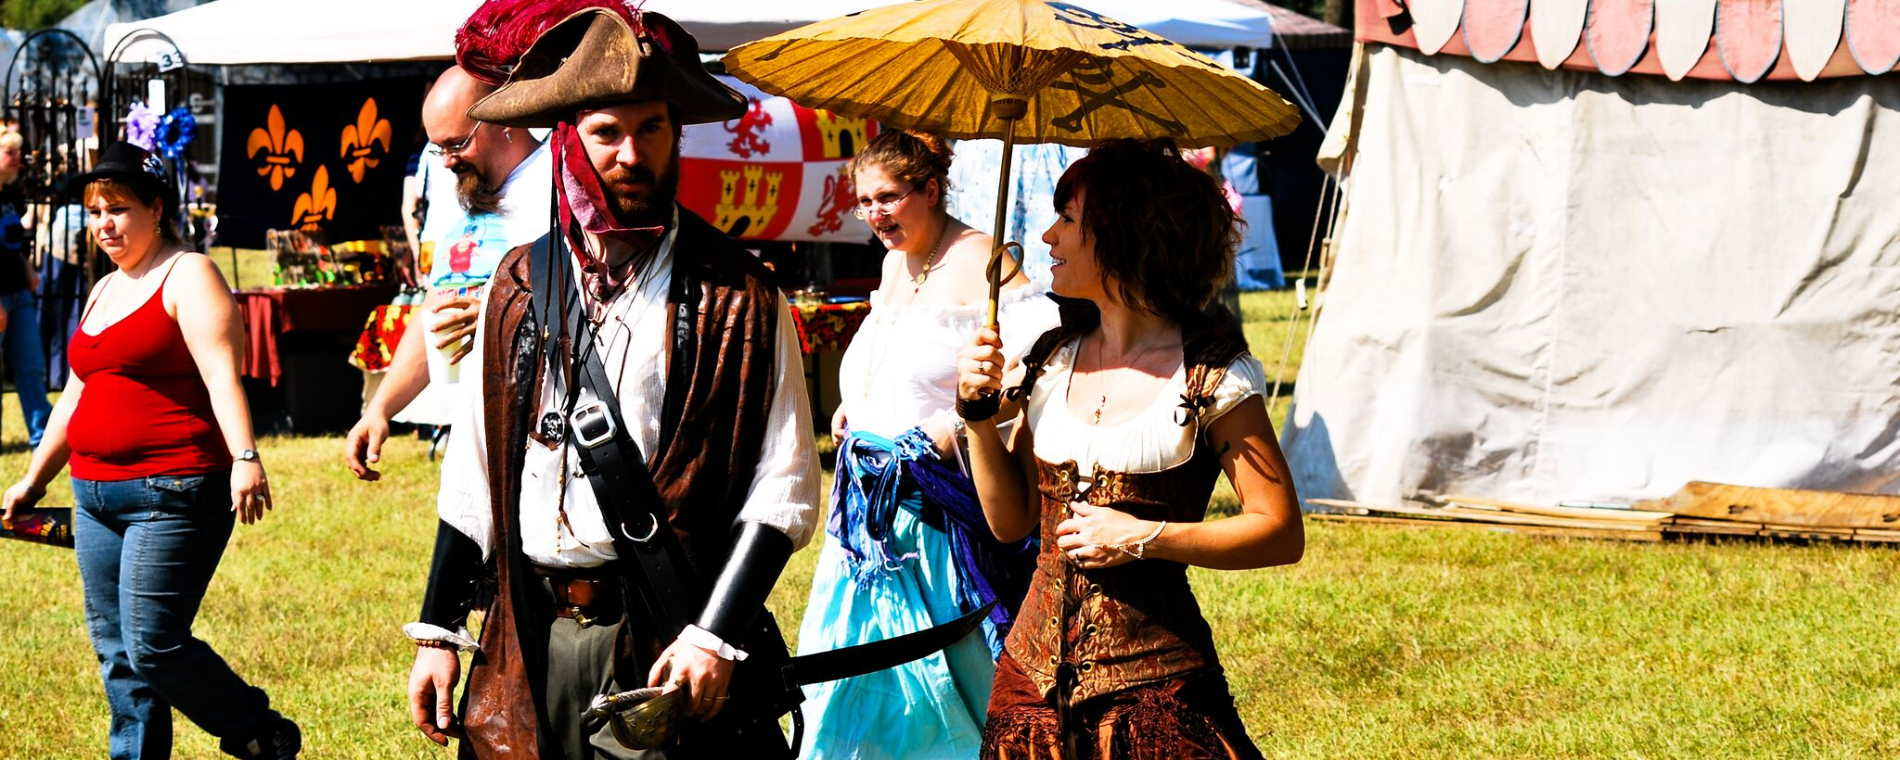 great-plains-renaissance-fair-in-wichita_visitwichita